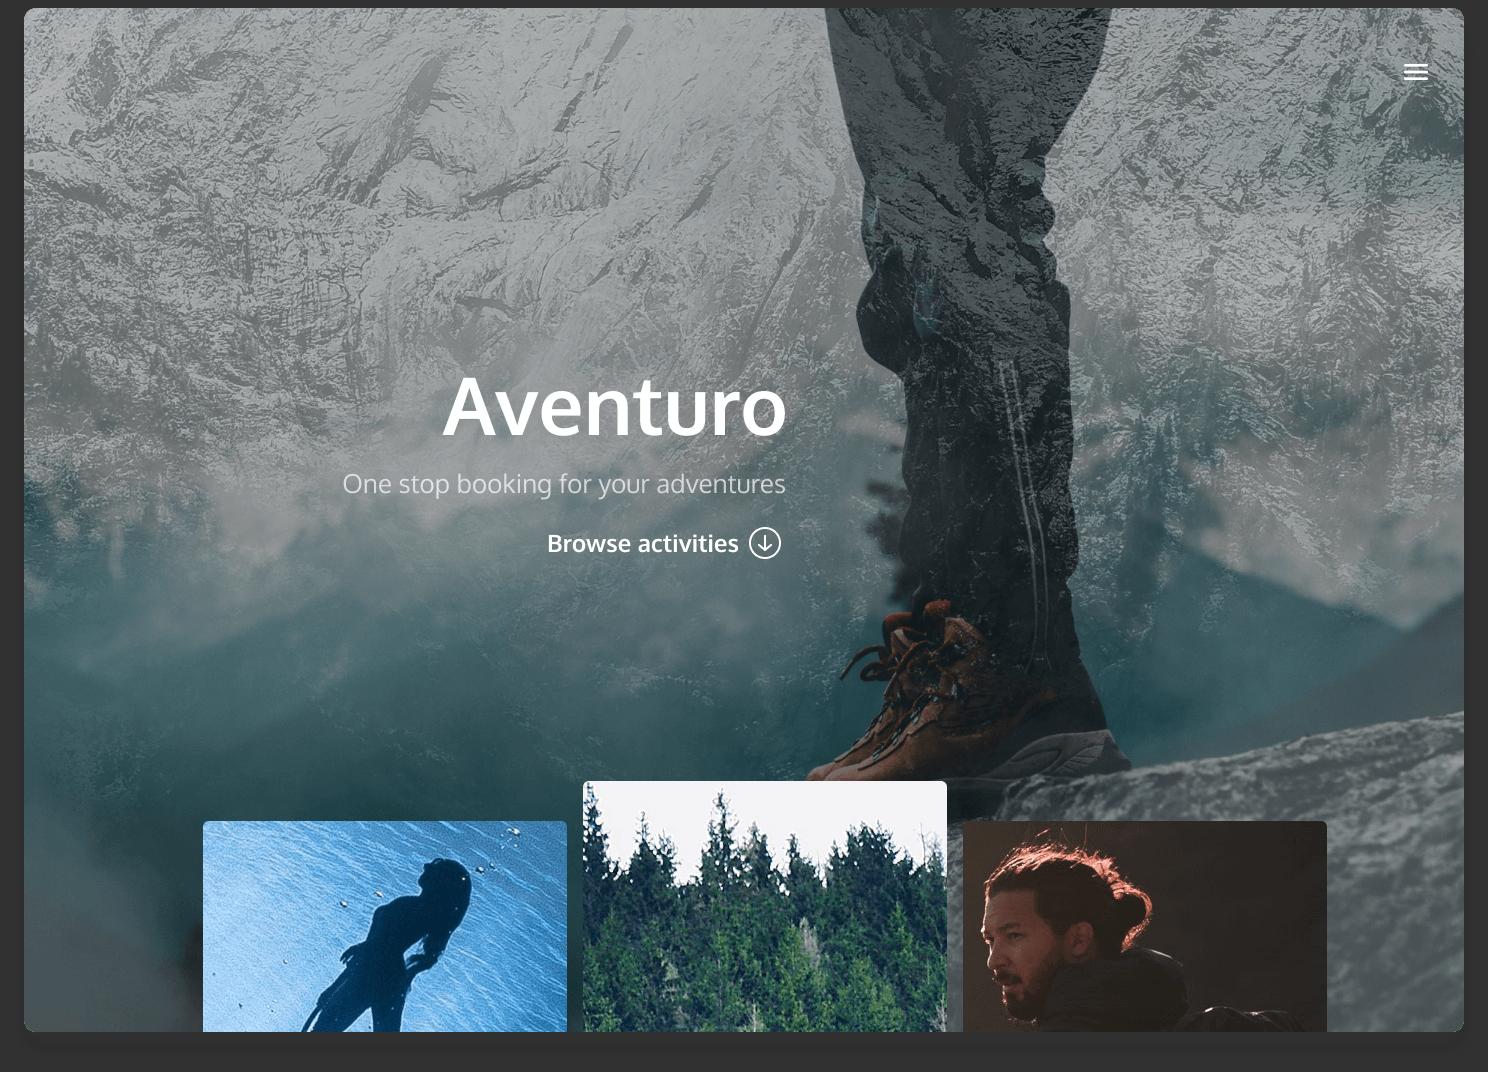 Aventuro website landing page